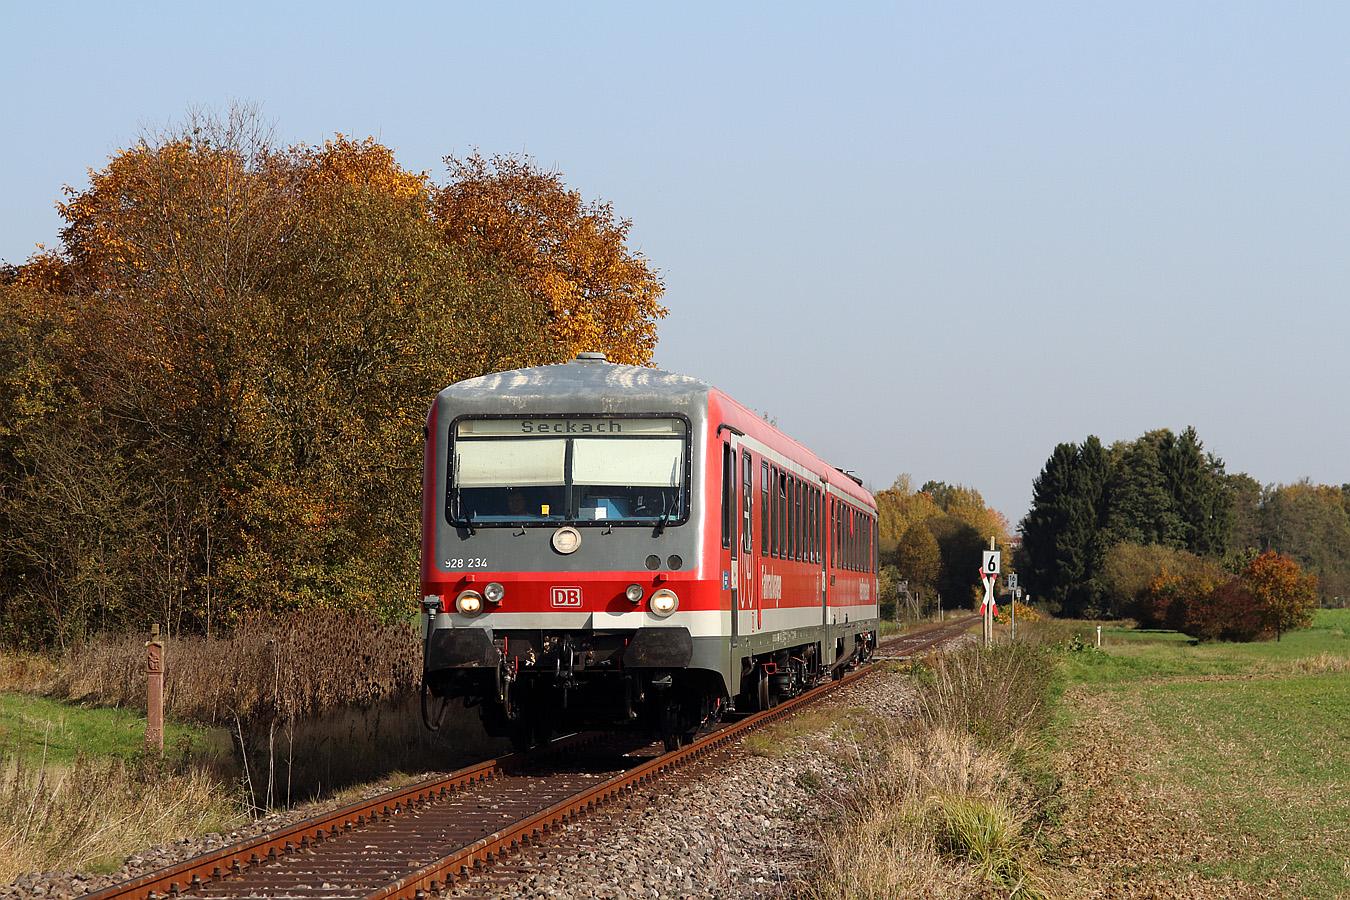 http://www.eisenbahnfotos-online.de/webspace/628234vr-161017-rhai-1350.jpg